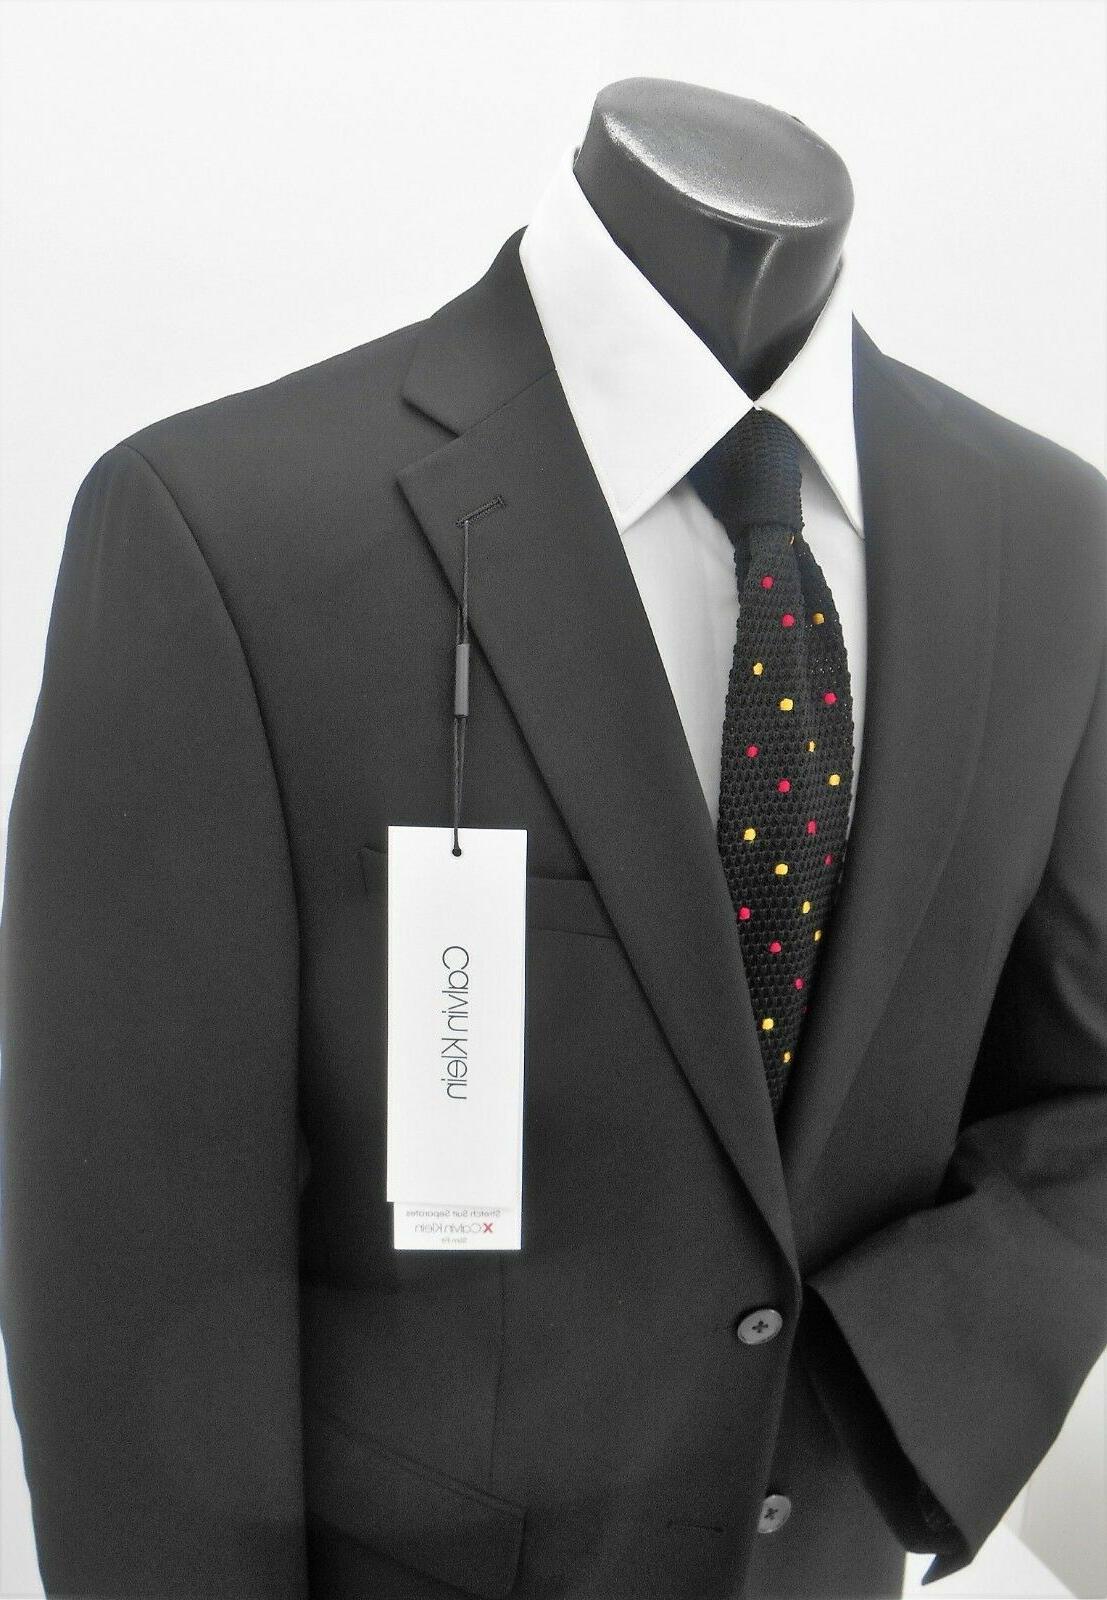 Calvin Men's Suit $130.00 44R